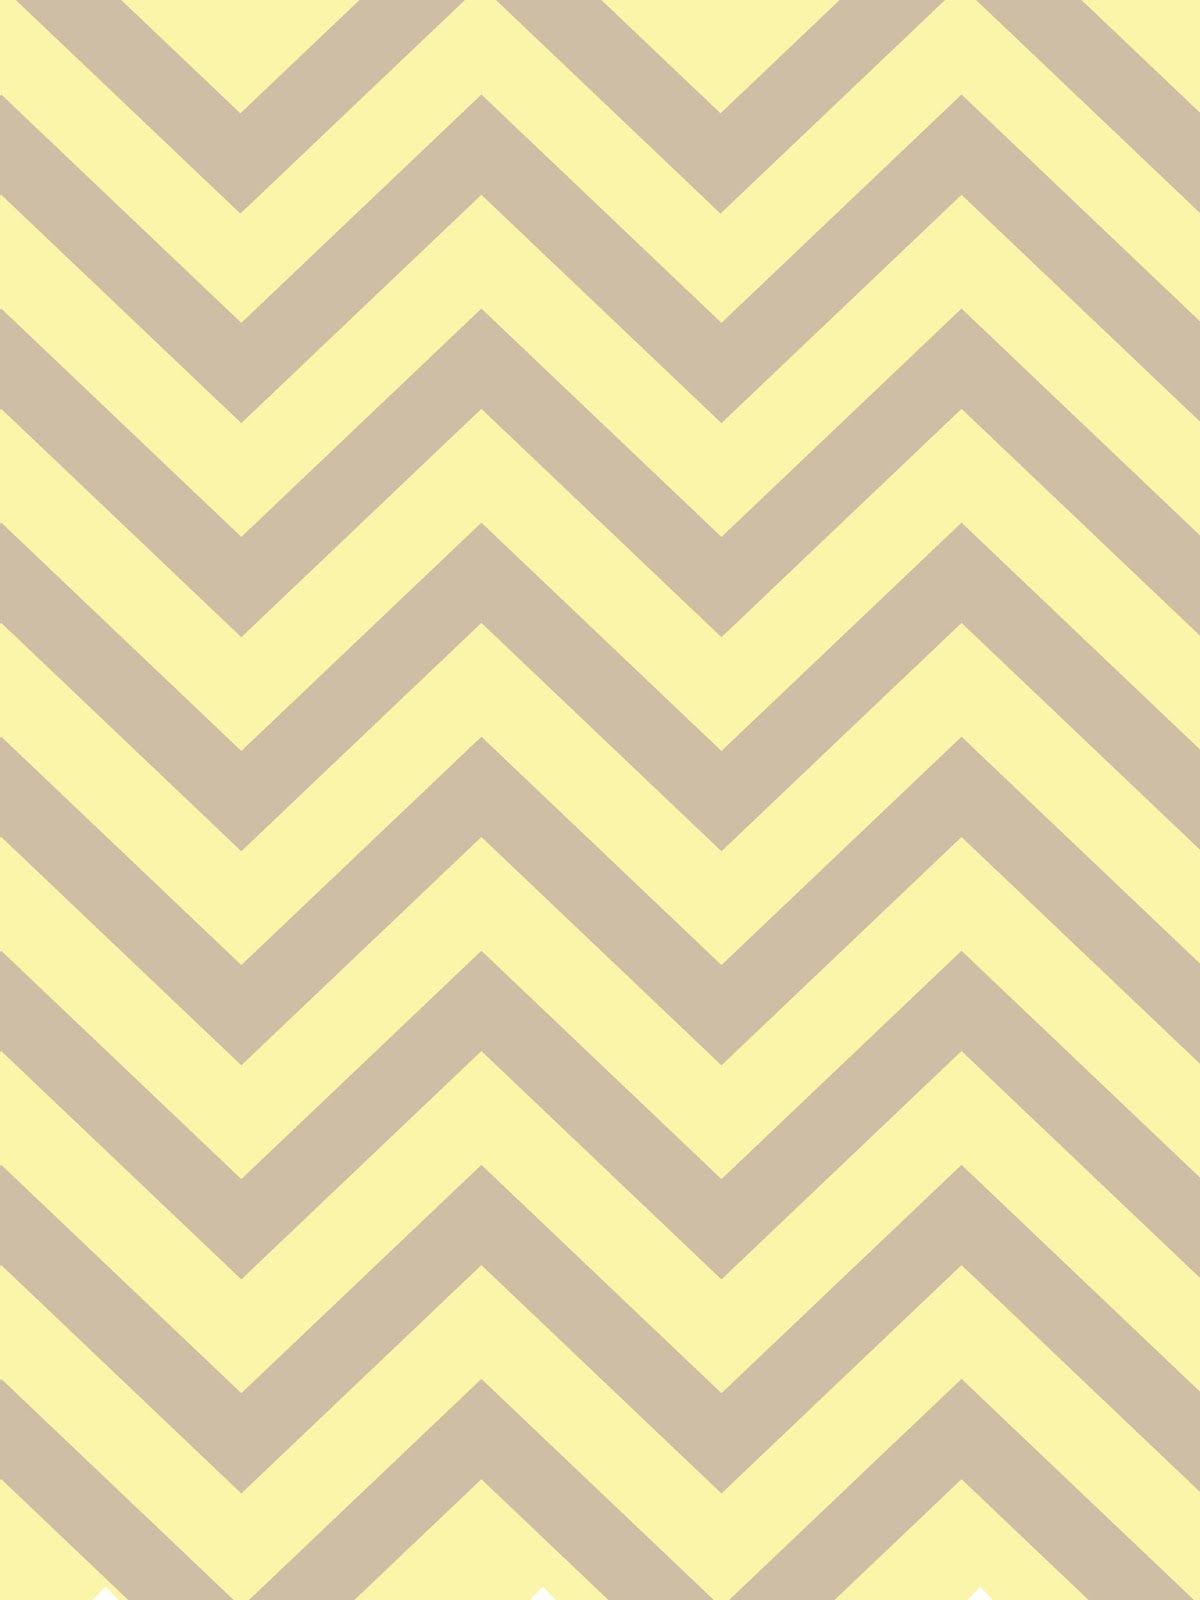 Chevron Light Yellow Sand Chevron Phone Wallpapers Chevron Wallpaper Pattern Wallpaper